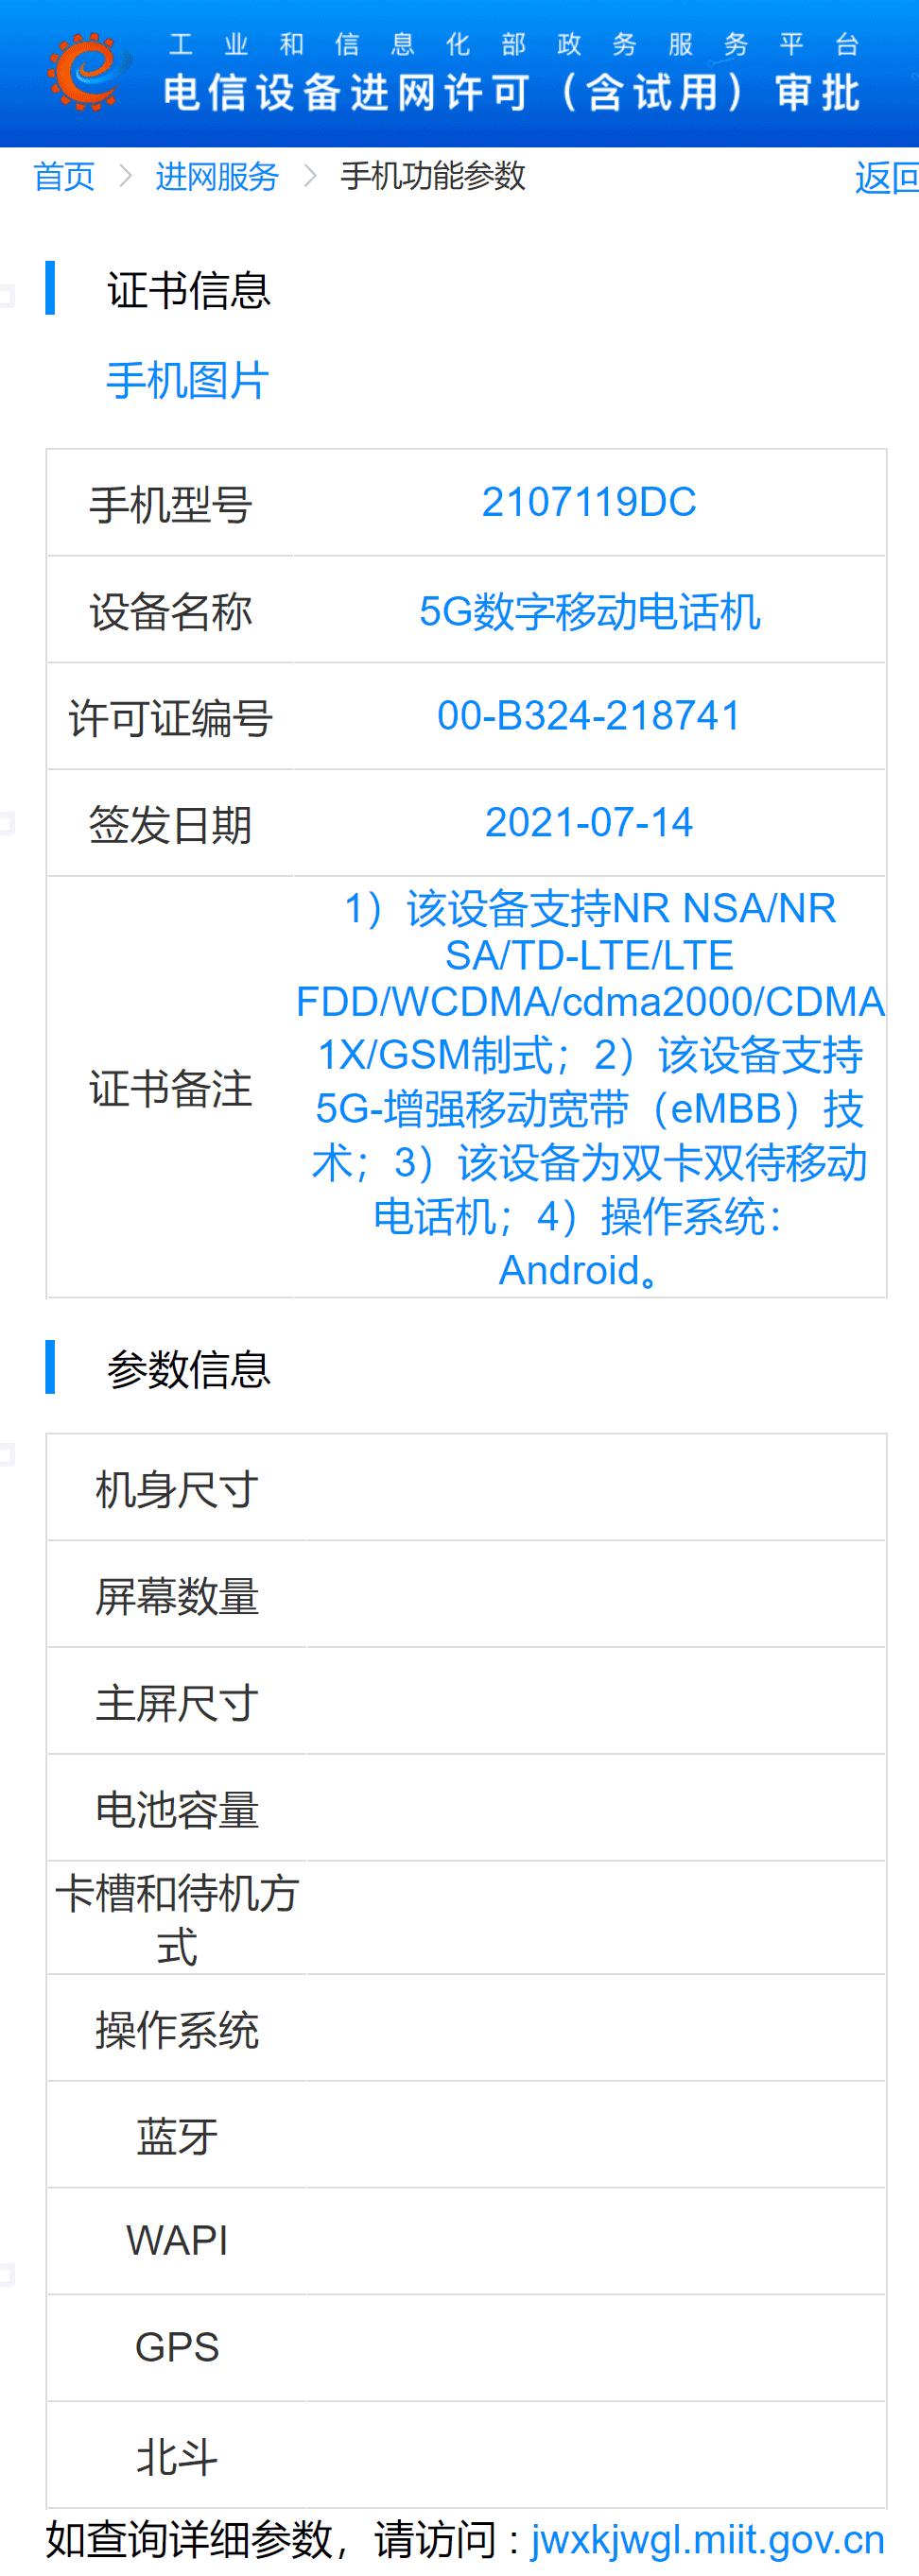 Xiaomi Mi MIX 4 and Xiaomi CC 11 series